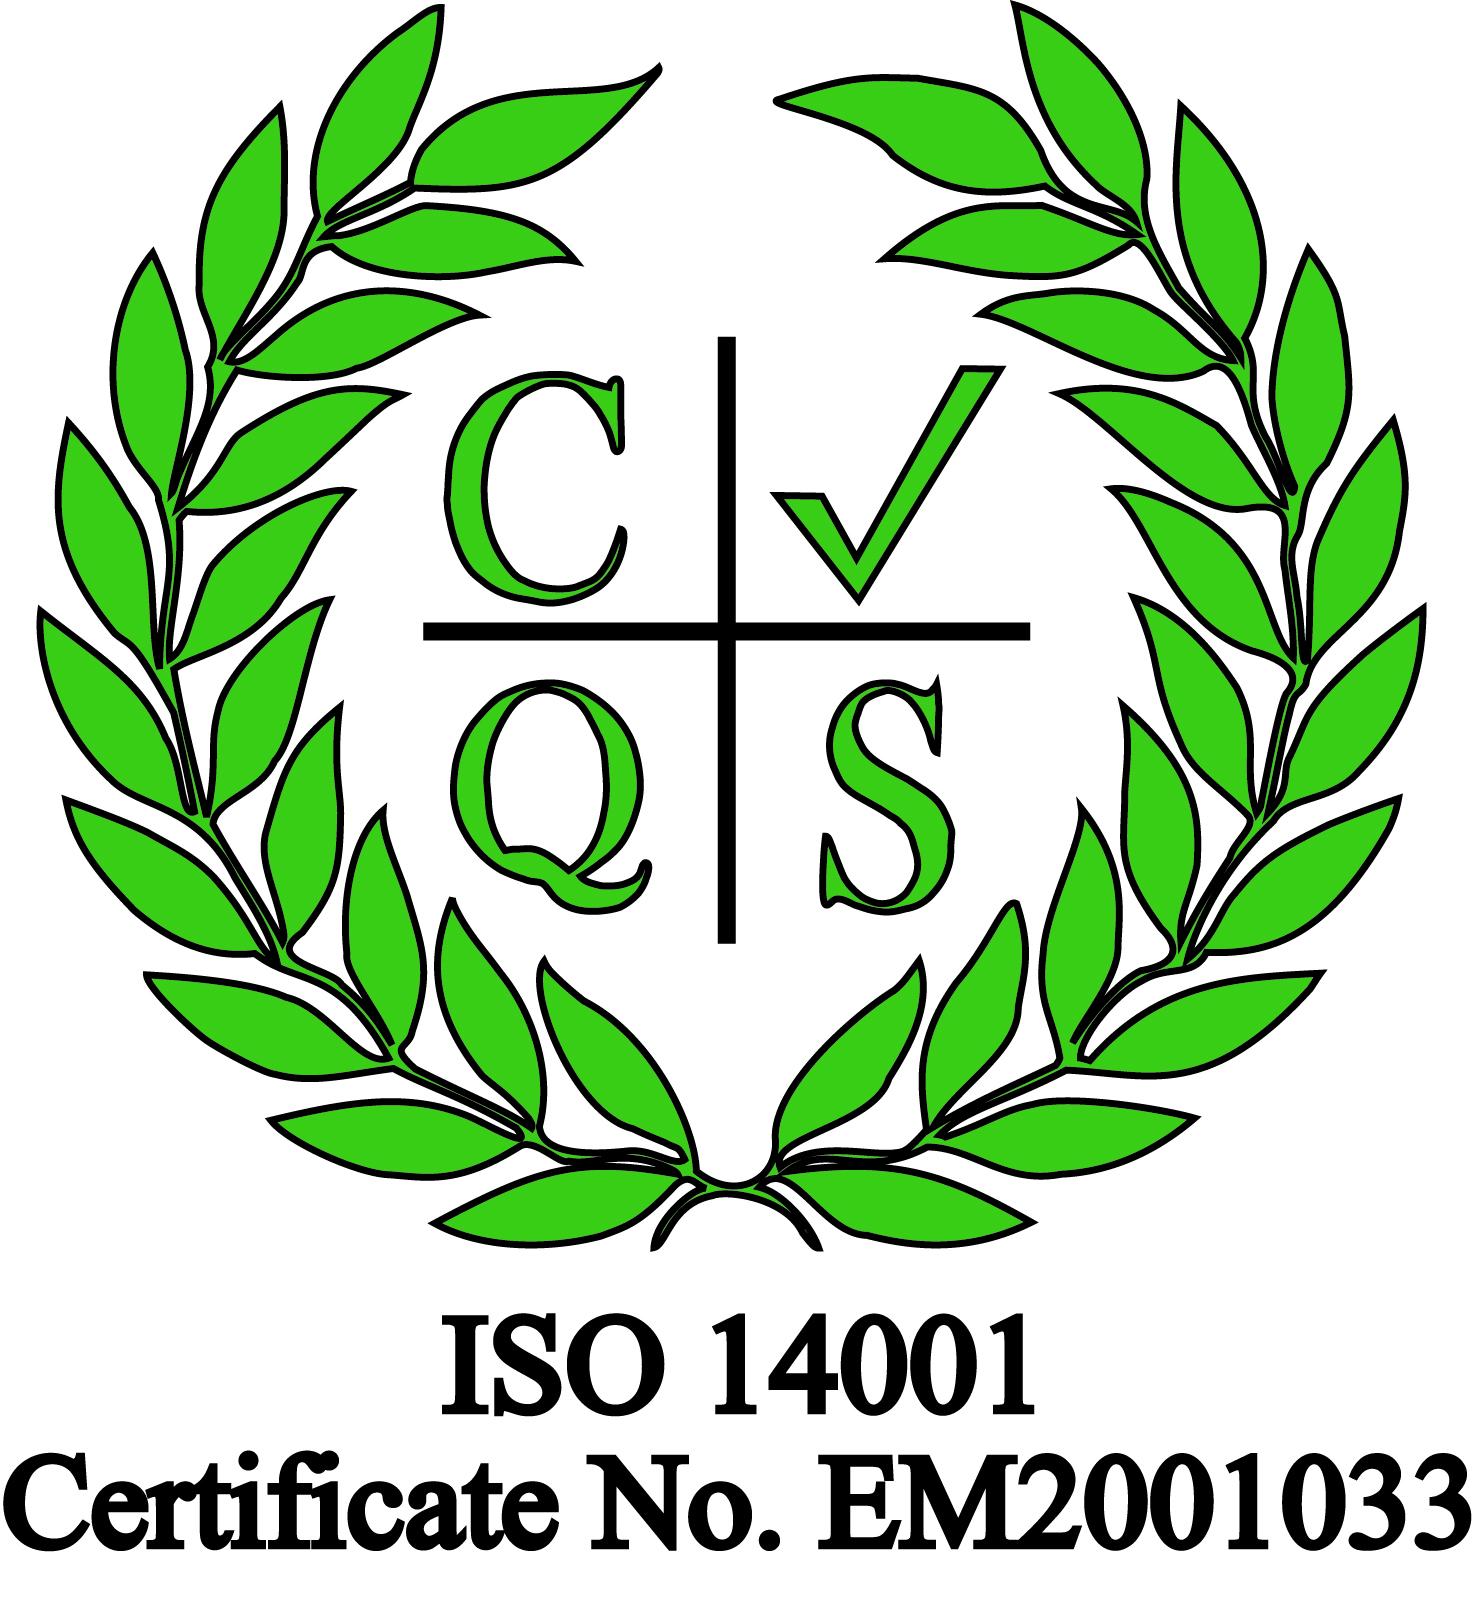 Medway_14001_Logo